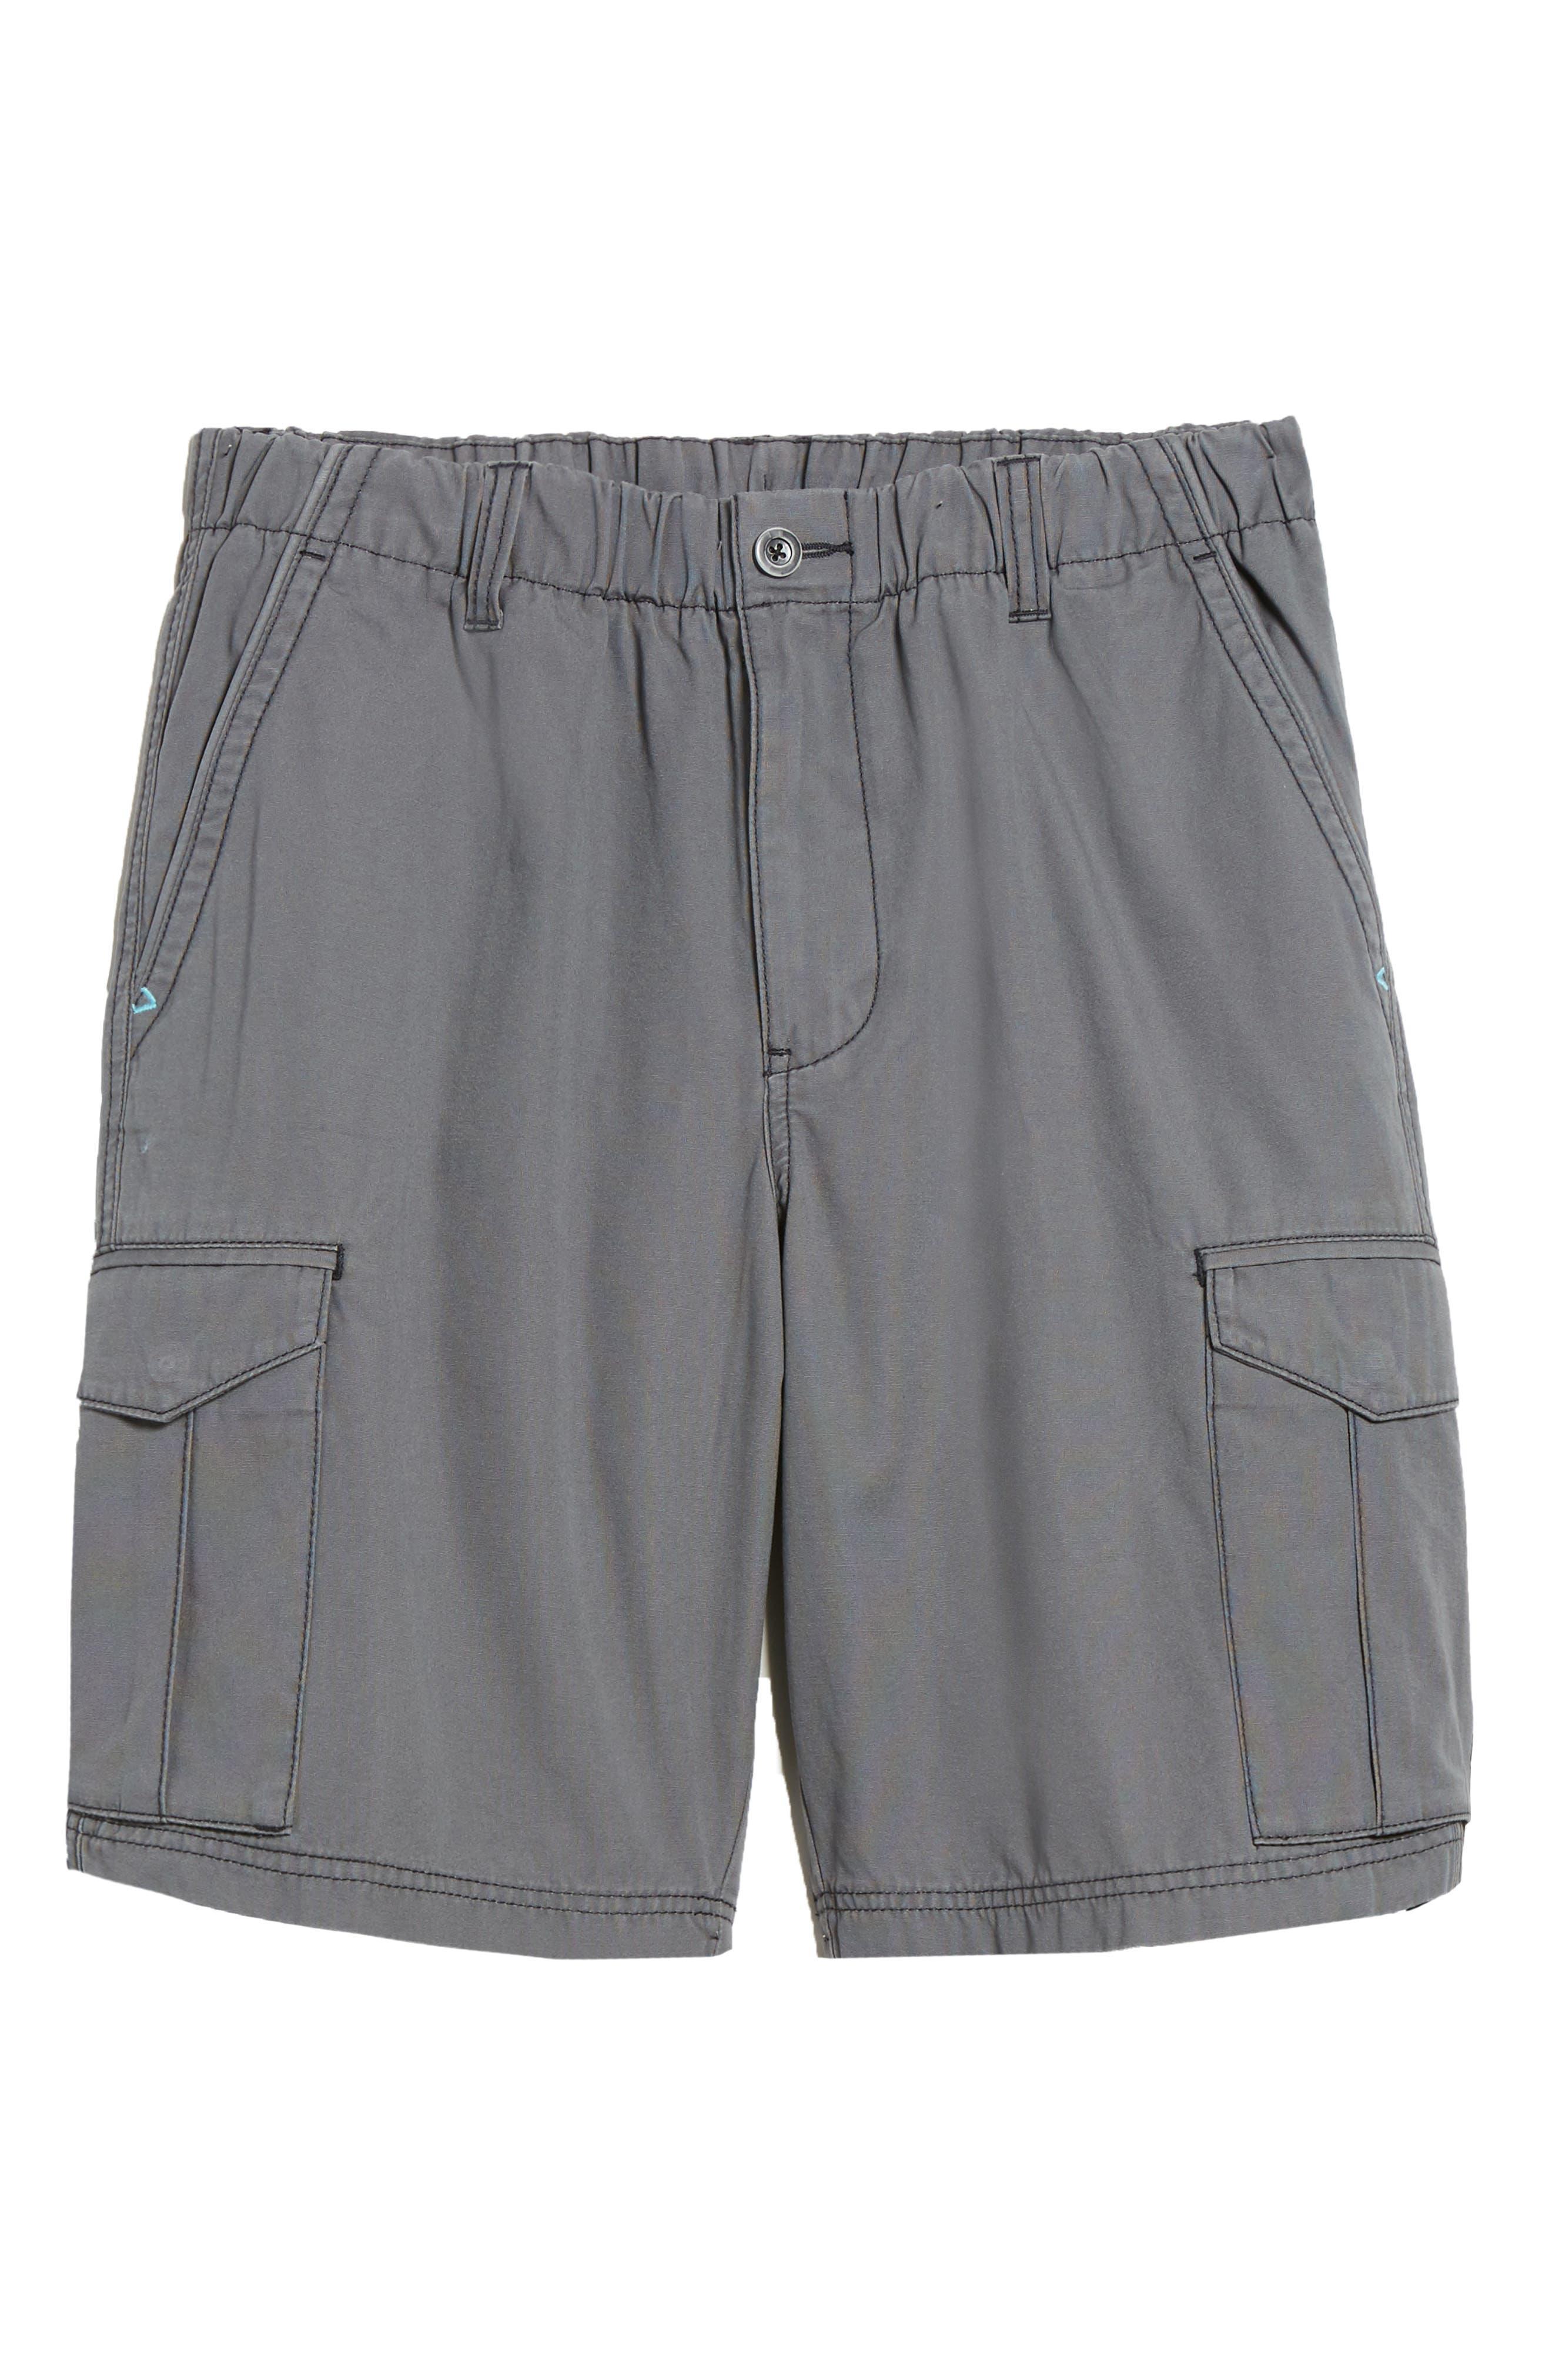 Island Survivalist Cargo Shorts,                             Alternate thumbnail 6, color,                             FOG GREY